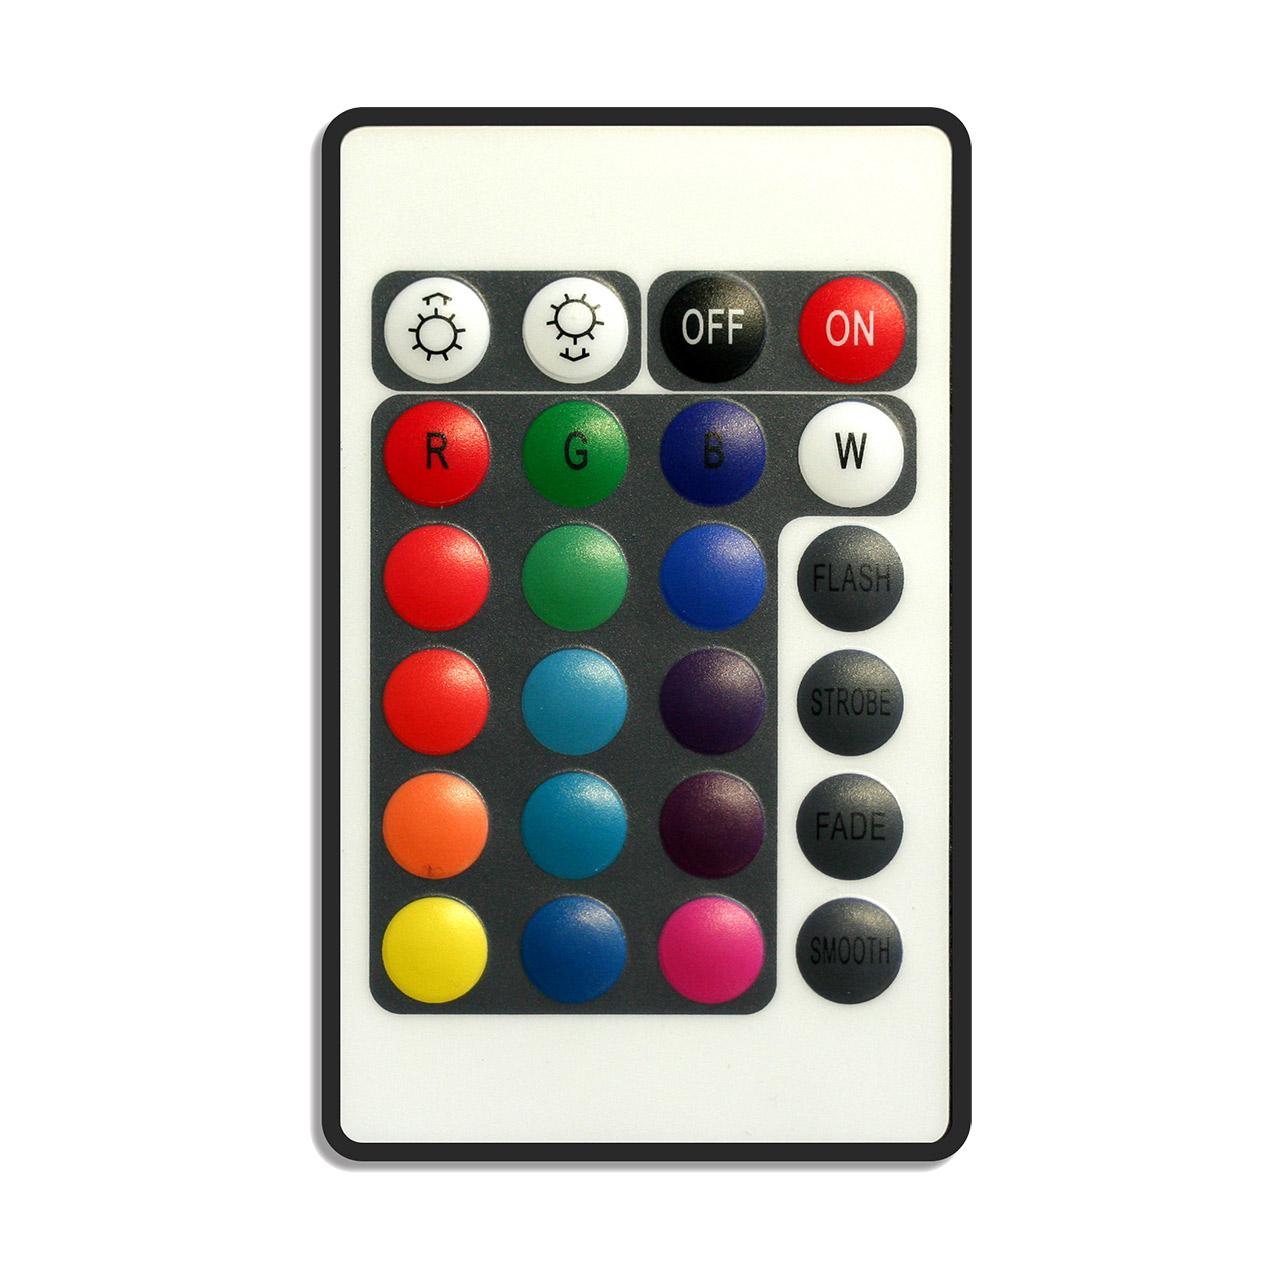 Nanoxia NXRGBC - Kabellos - Schwarz - Weiß - Tasten - IR Wireless - 12 V - 3x 2 A